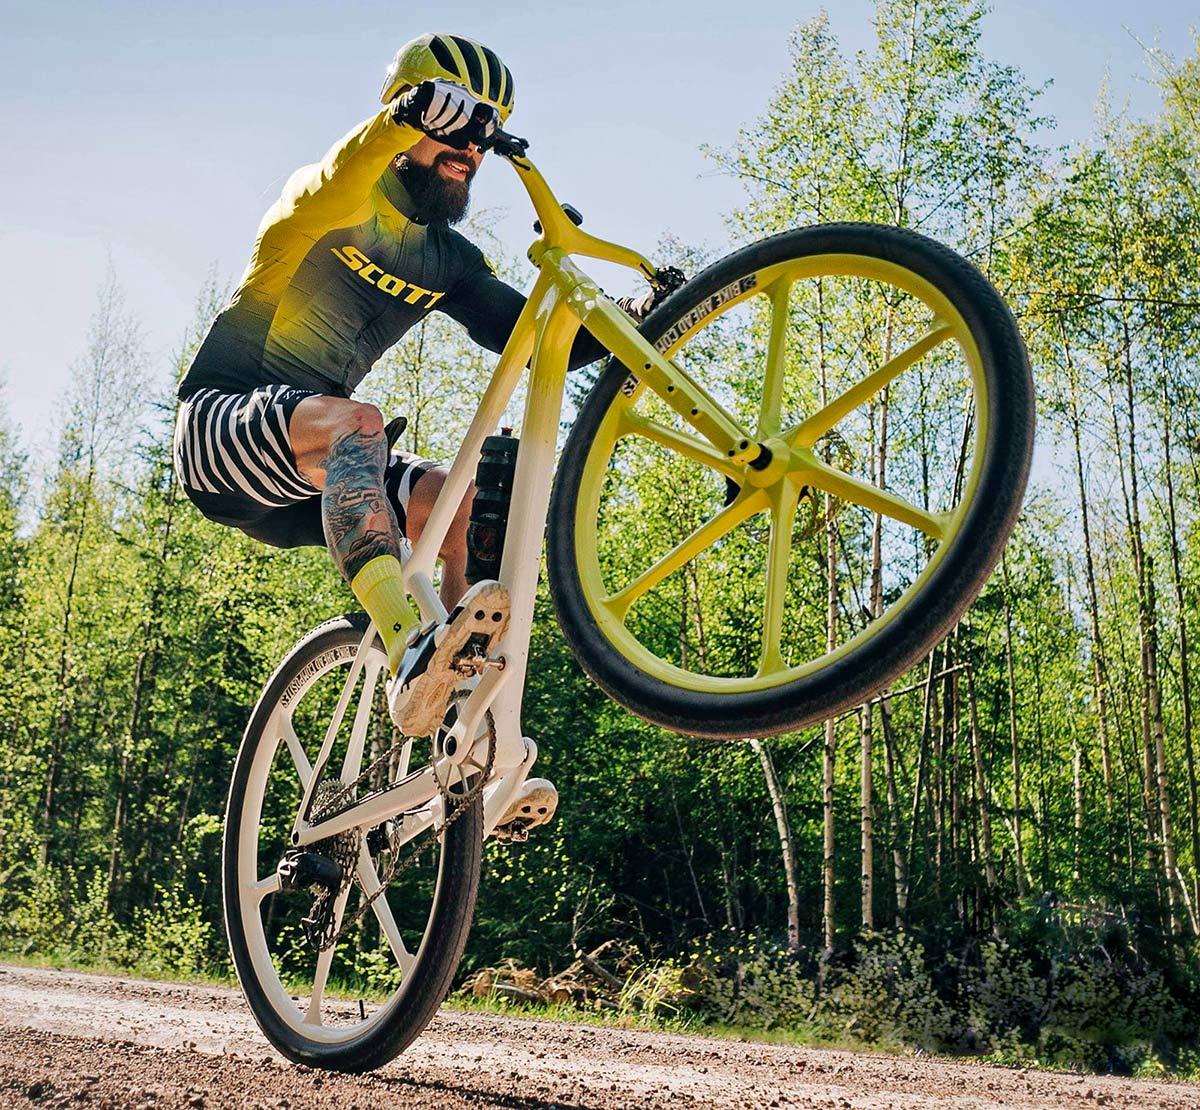 Dangerholm mellow yellow Scott Scale Gravel custom project bike, Gustav Gullholm dream bike builder, photo by Andreas Timfalt,riding